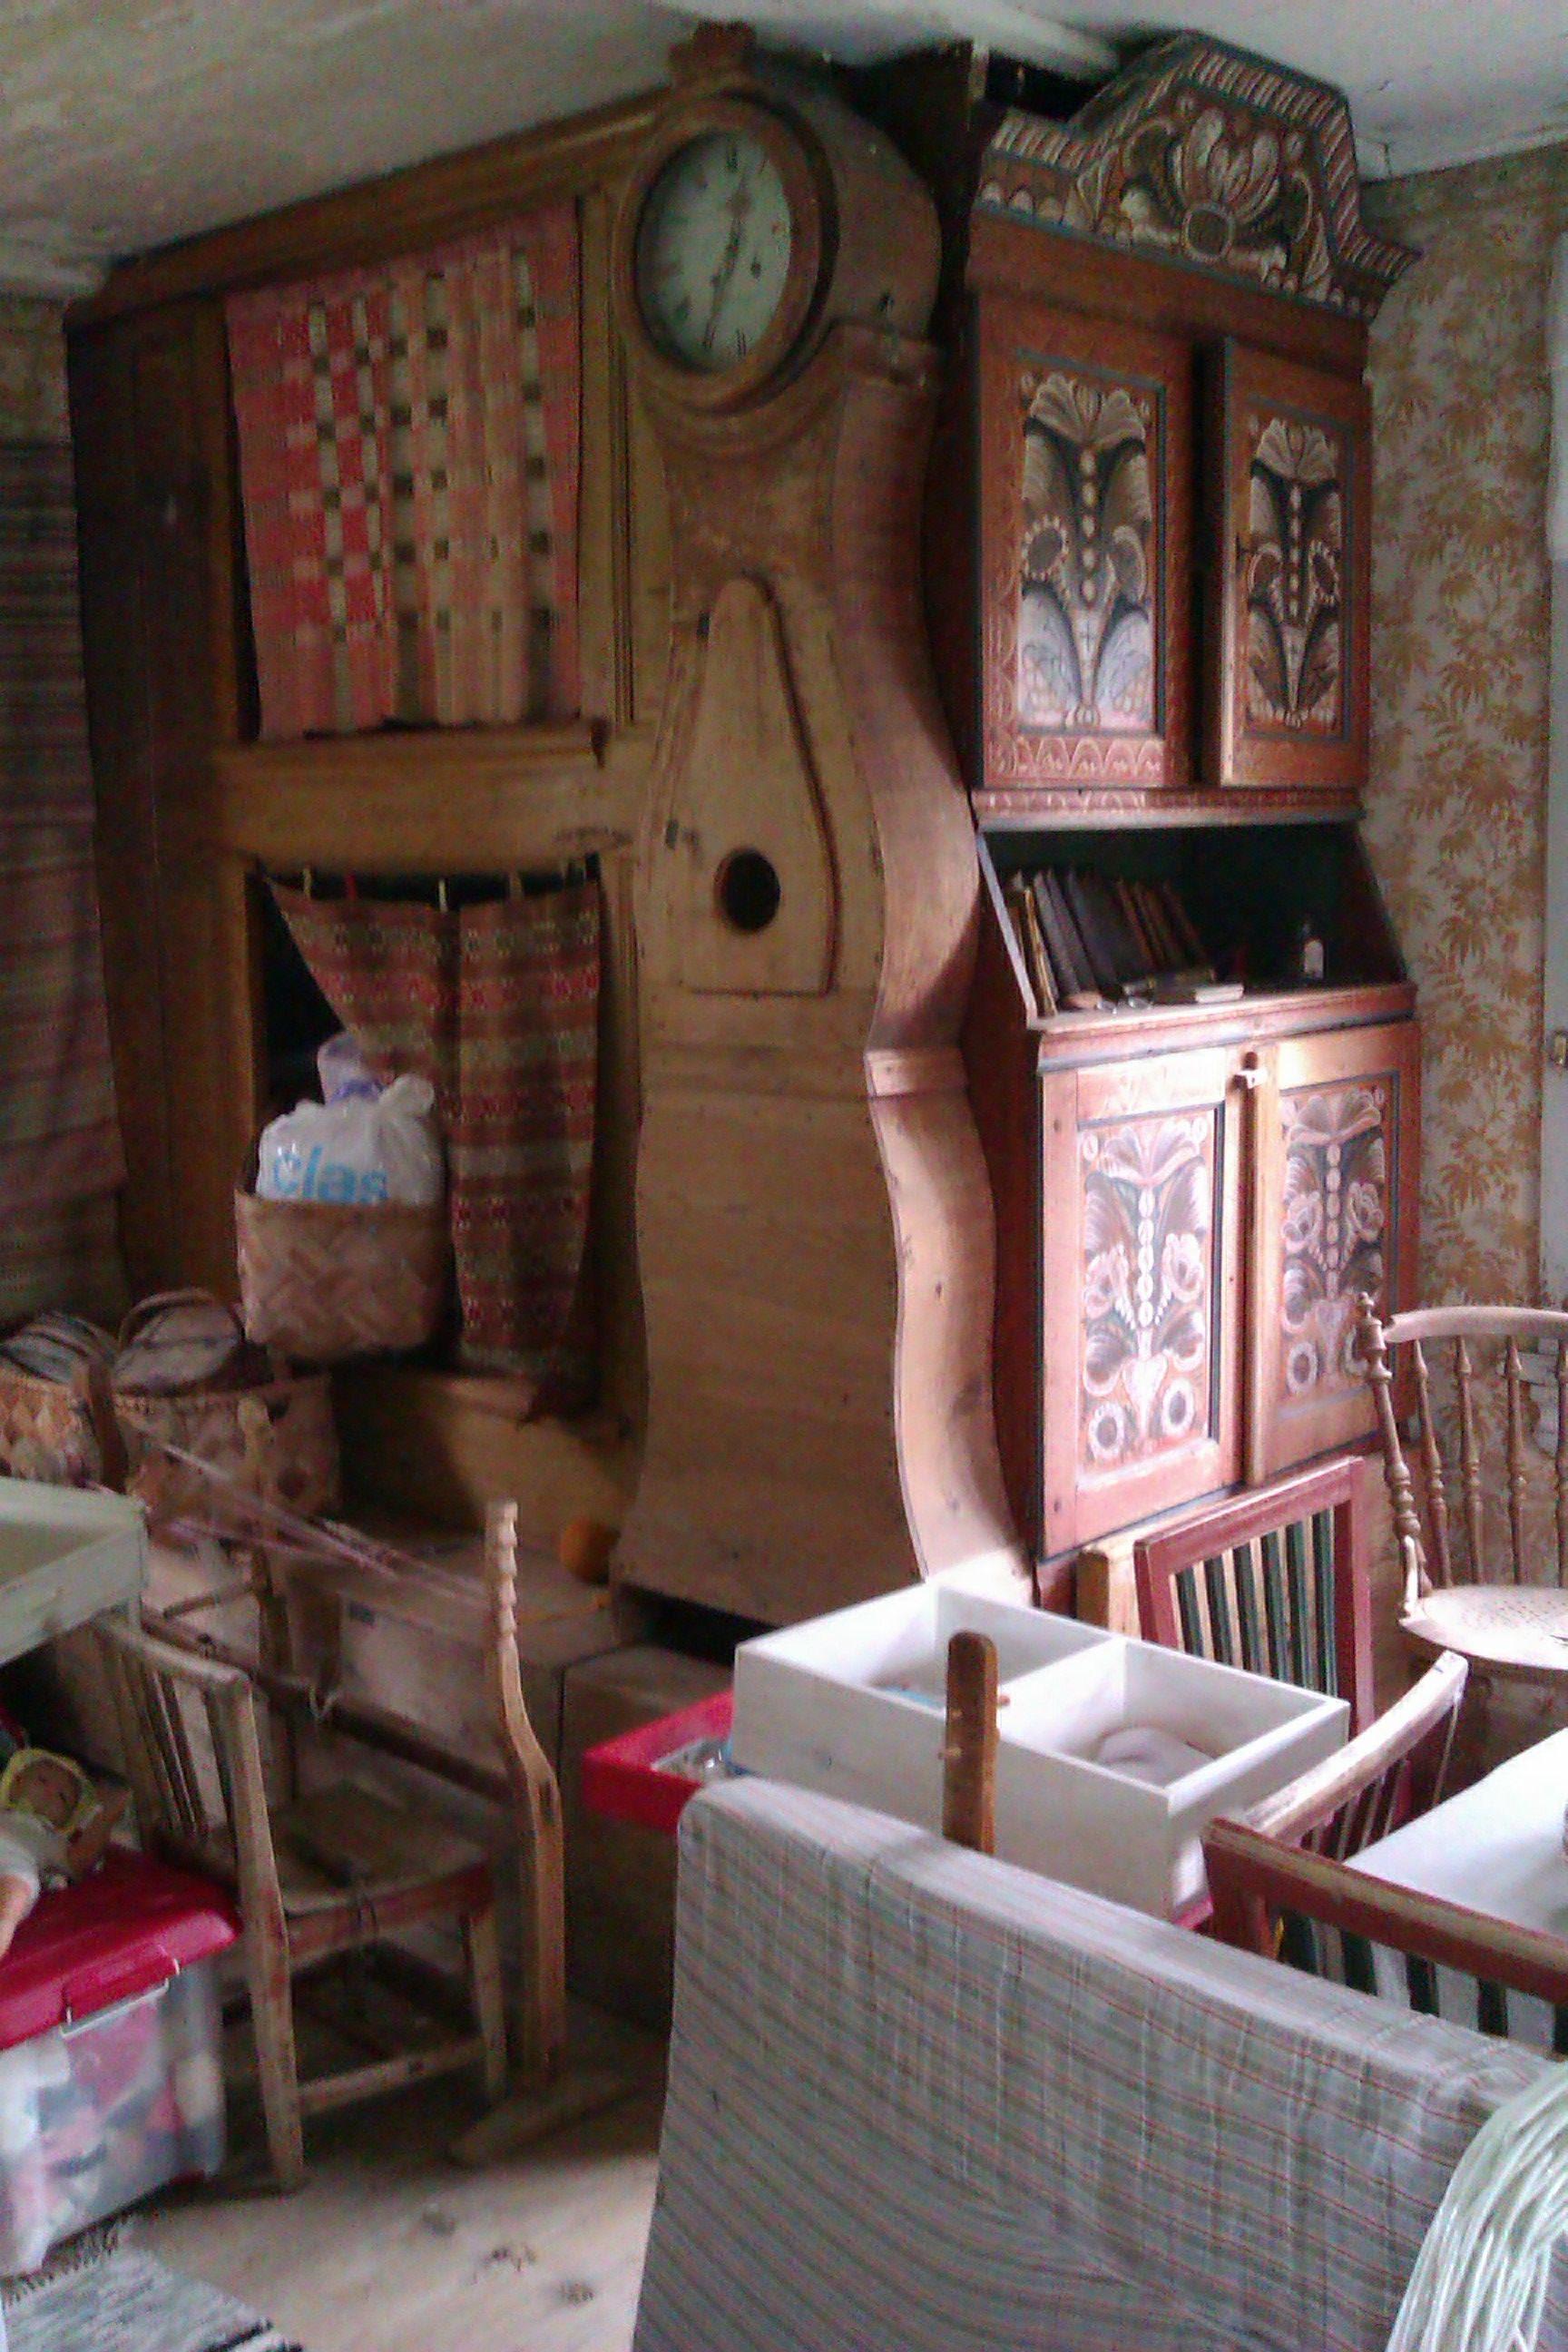 Pin By Peggy Farmer On Scandinavian Scandinavian Interior Design Scandinavian Interior Scandinavian